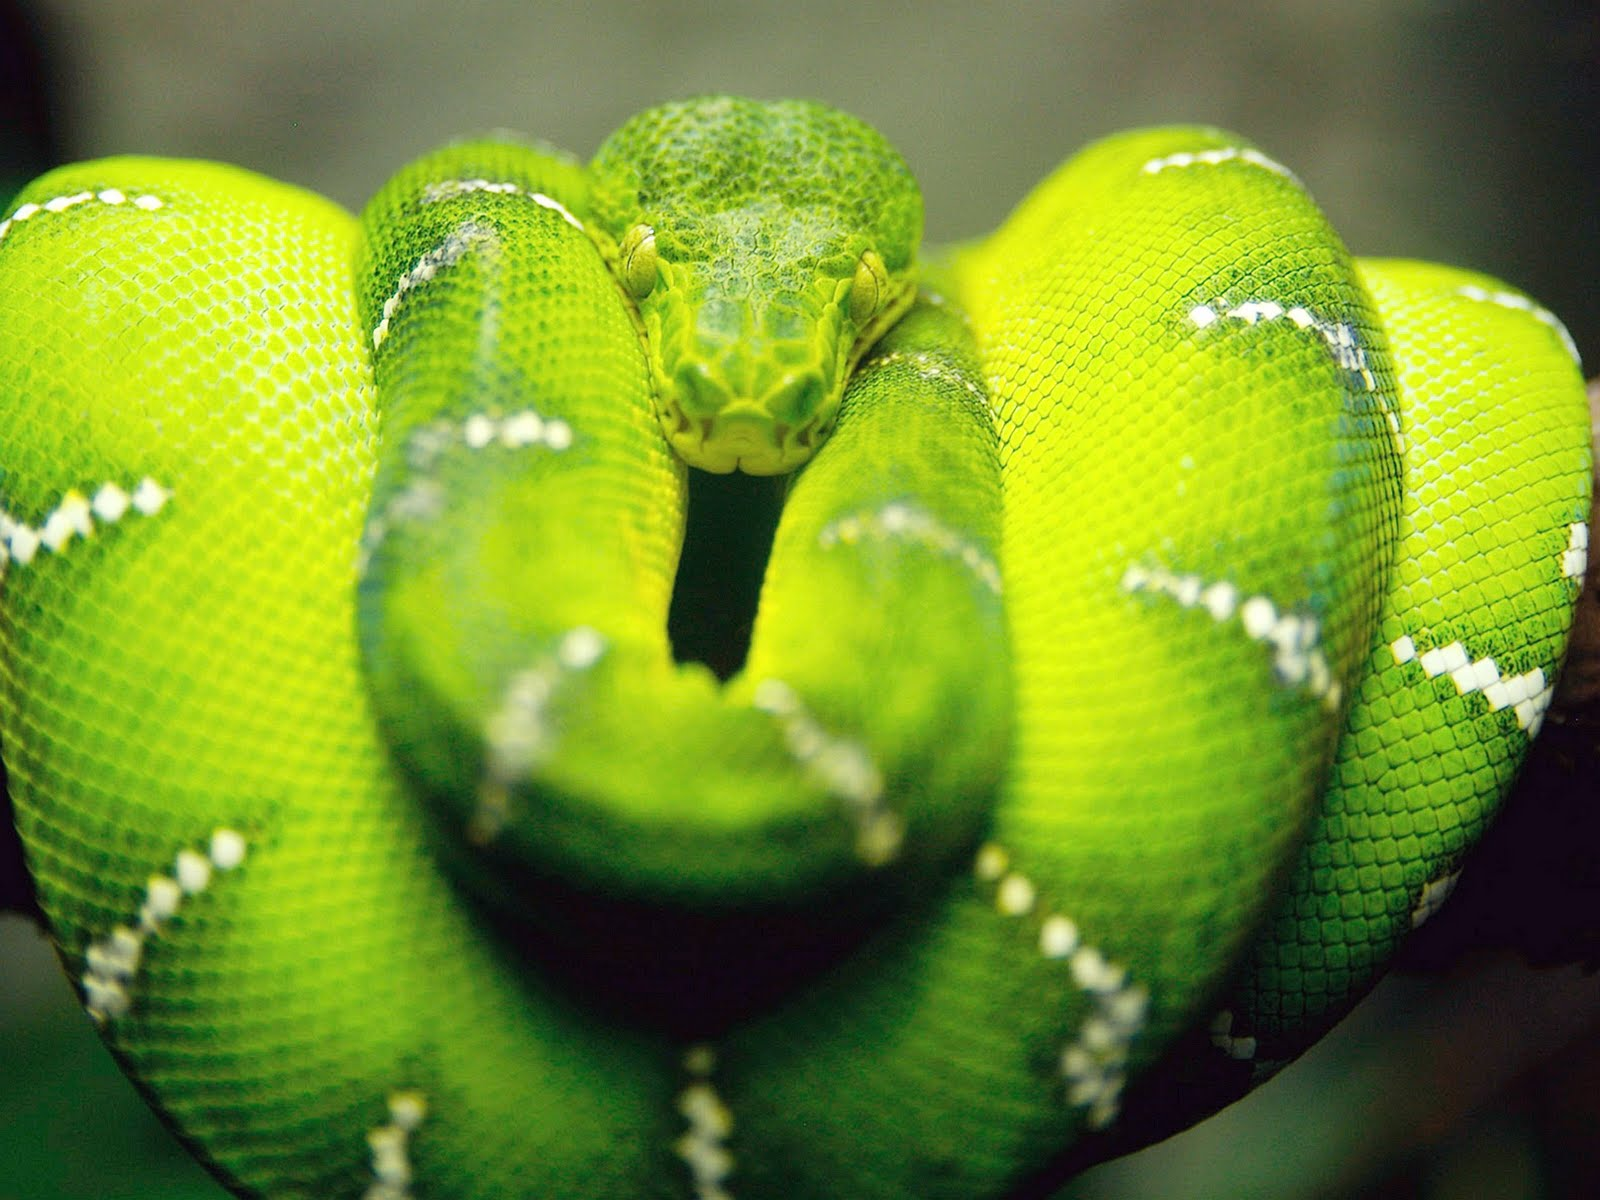 Hd wallpaper of green snake hd wallpapers - Green snake hd wallpaper ...